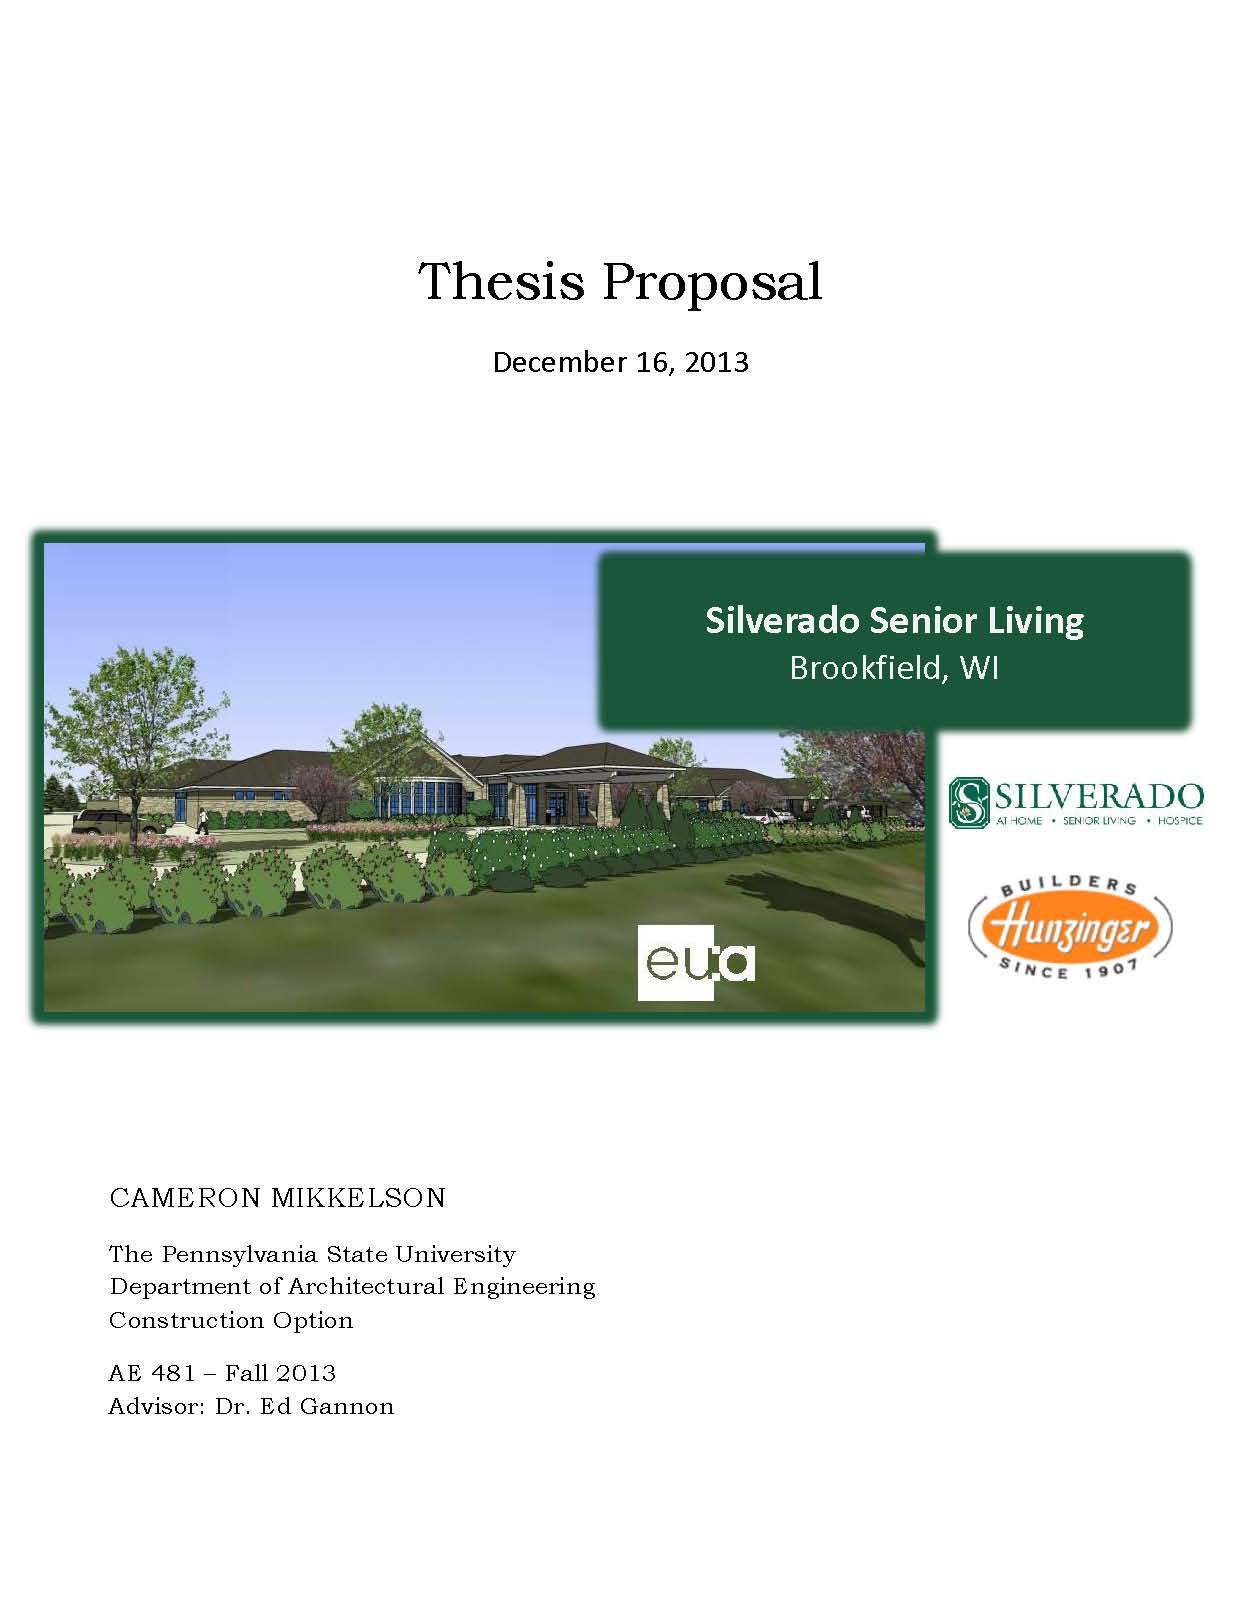 Construction management dissertation proposal